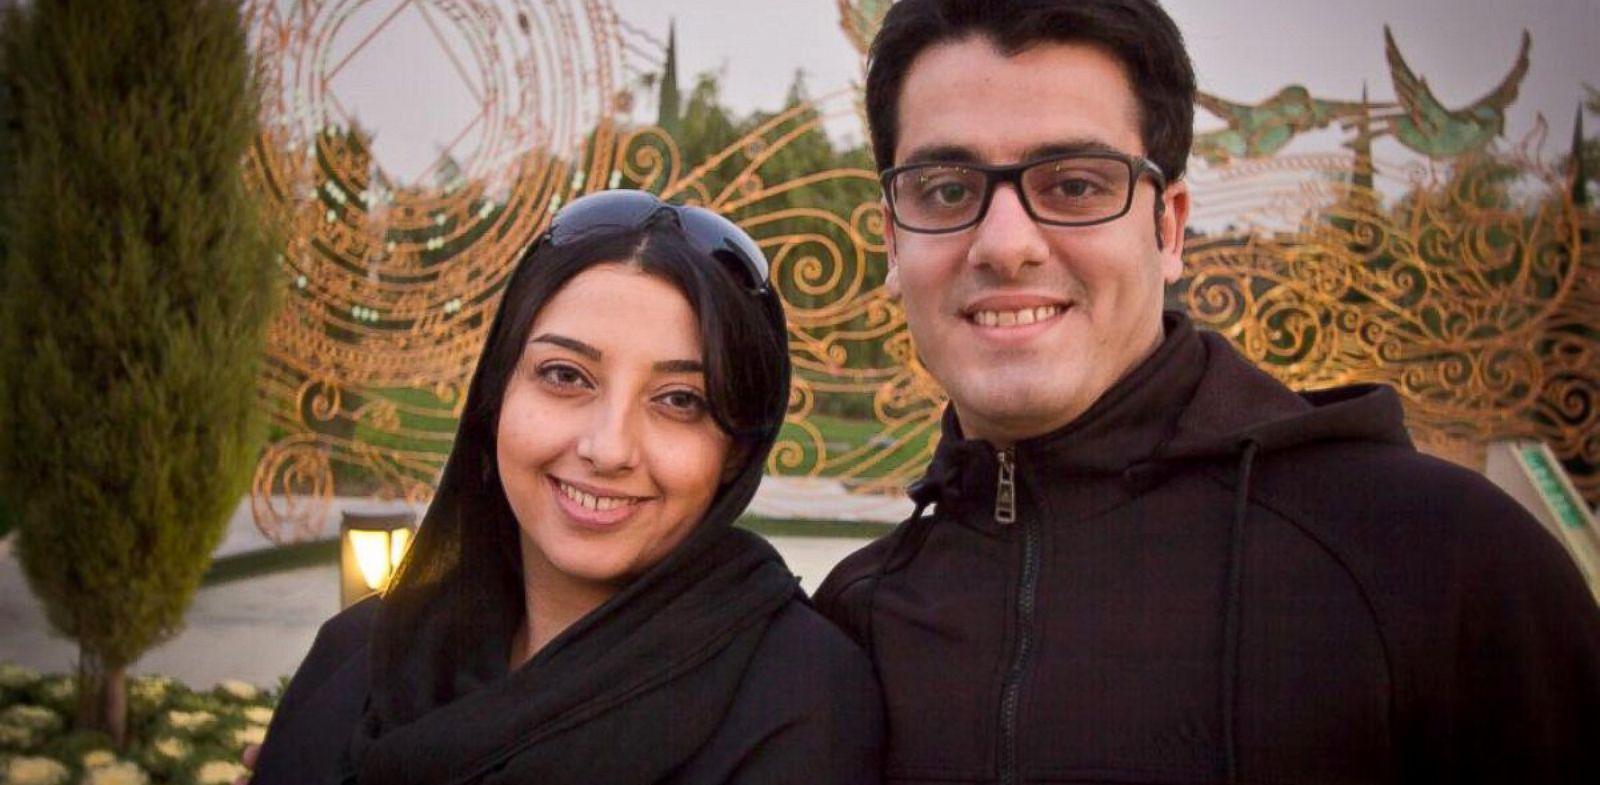 PHOTO: Faces of Iran